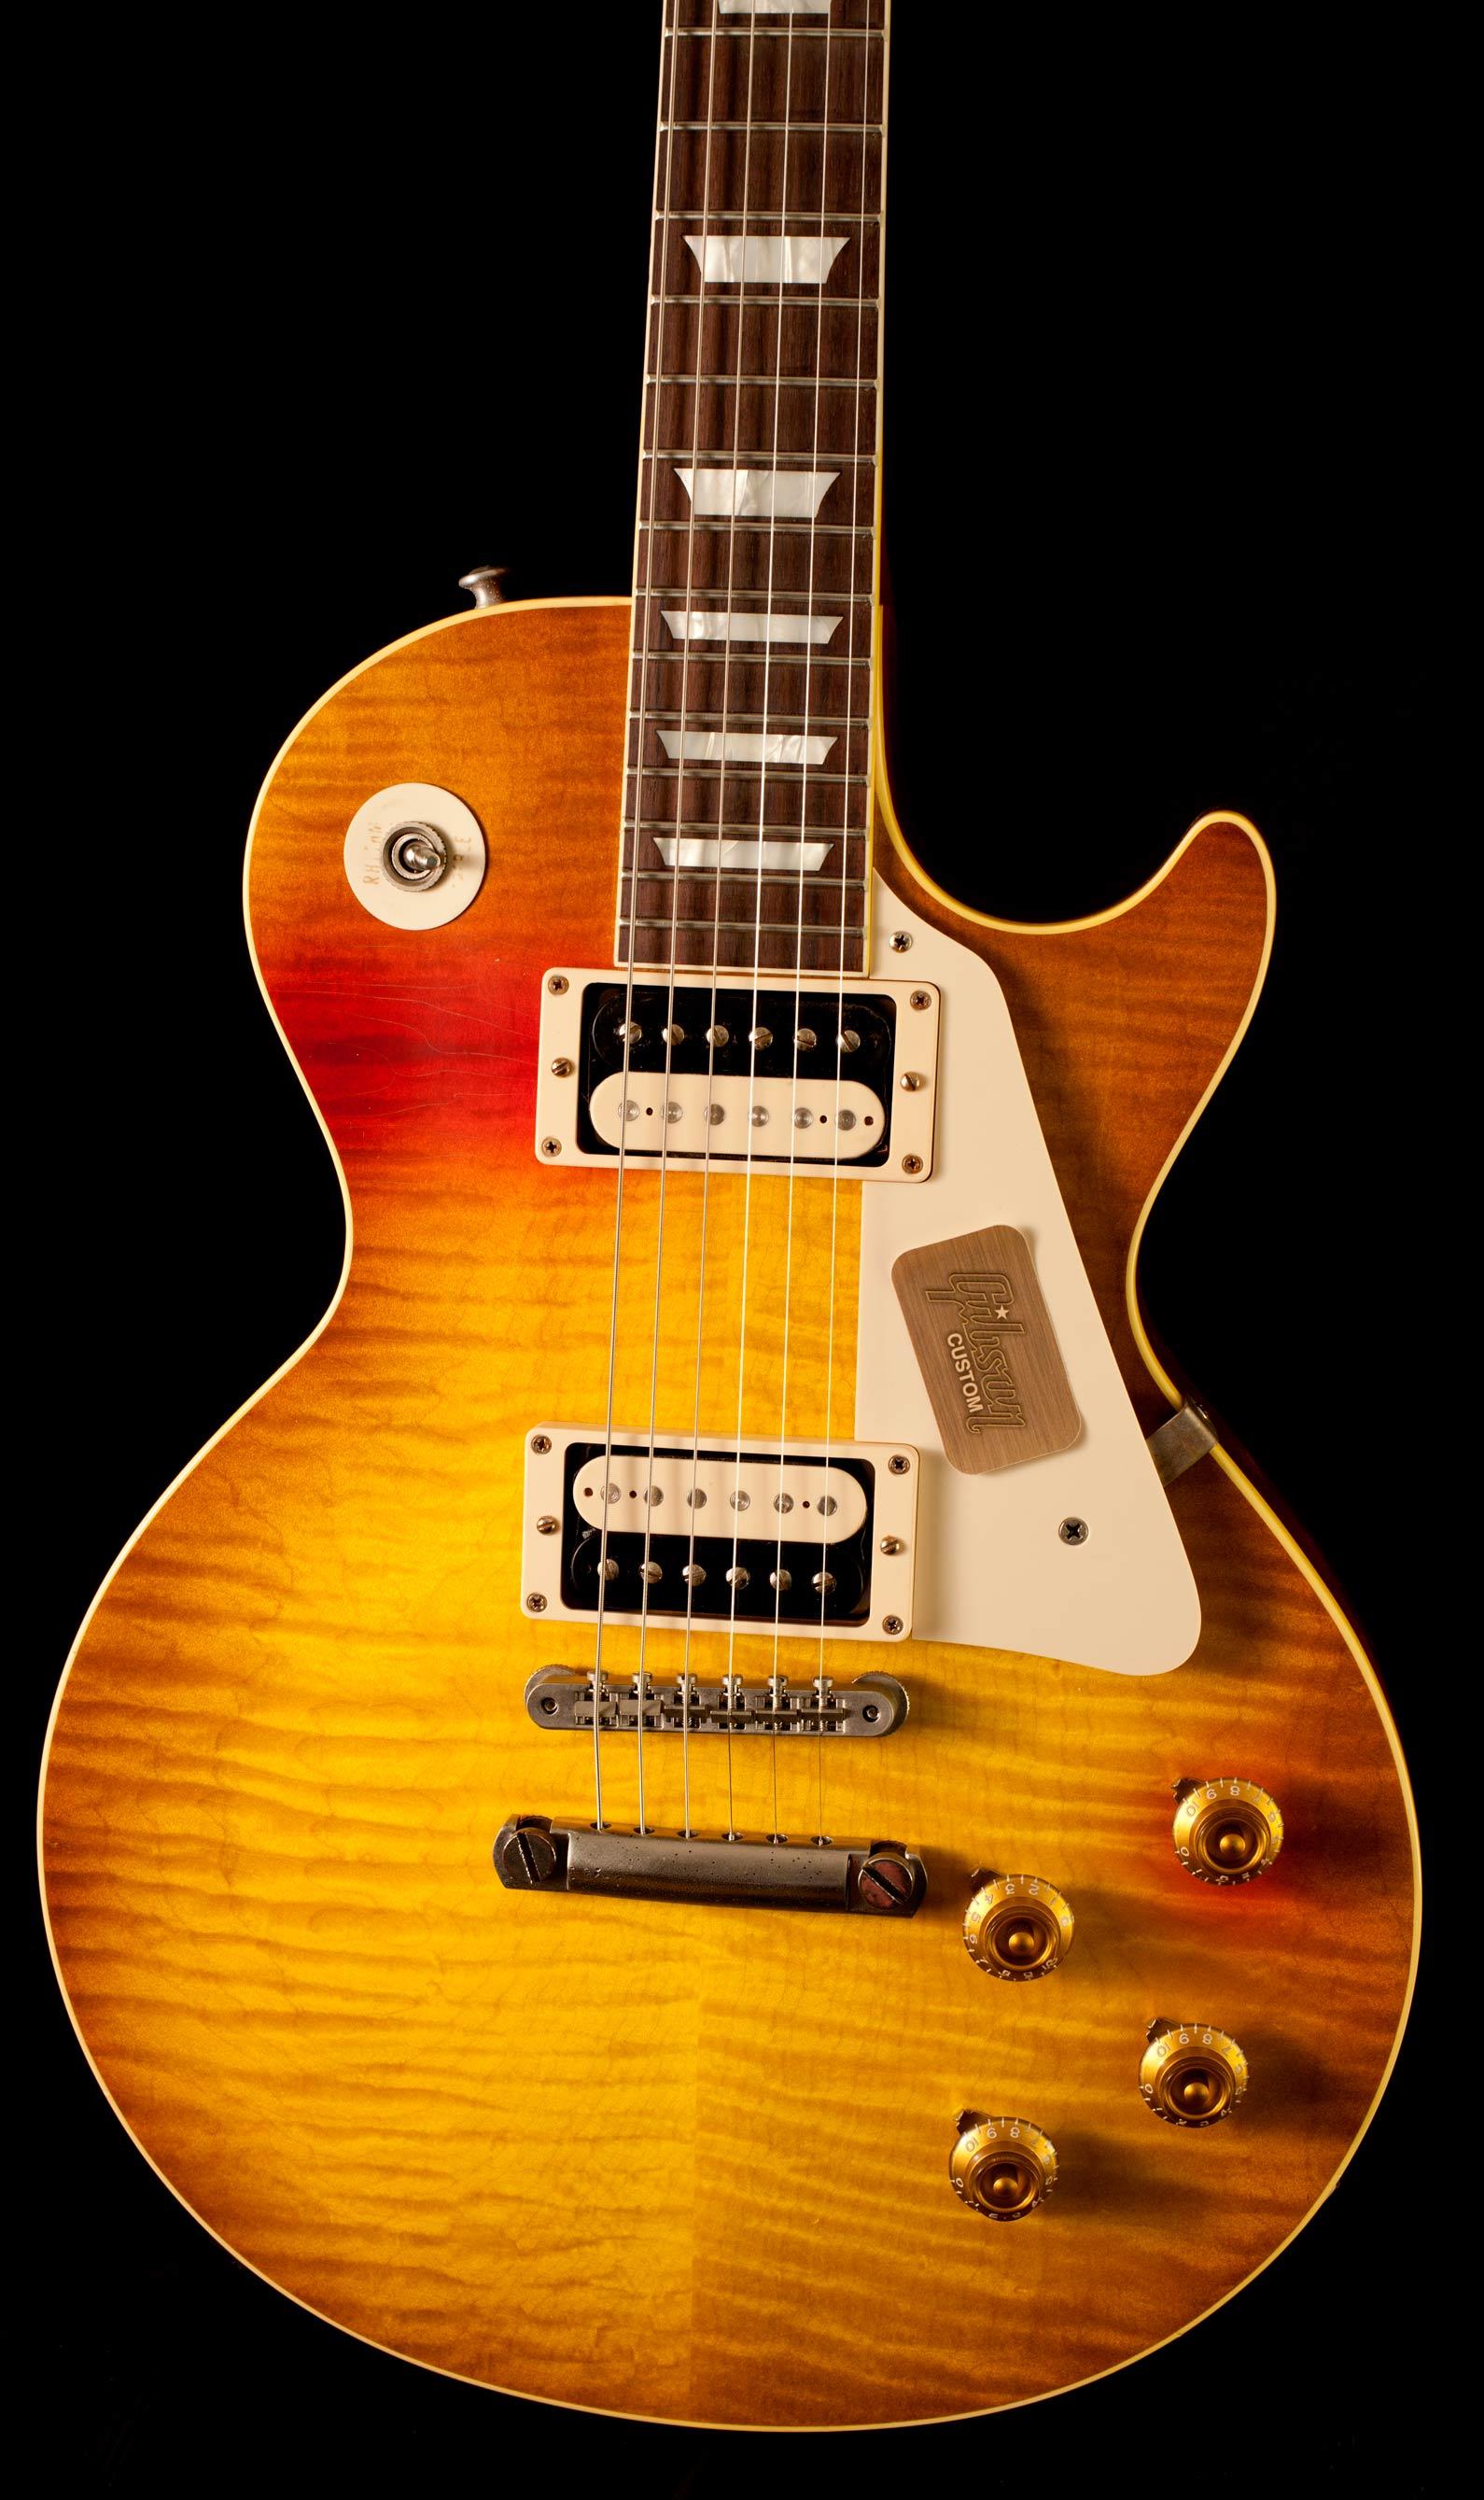 gibson les paul cc 16 ed king 1959 aged 2014 guitar for sale gitarren total. Black Bedroom Furniture Sets. Home Design Ideas